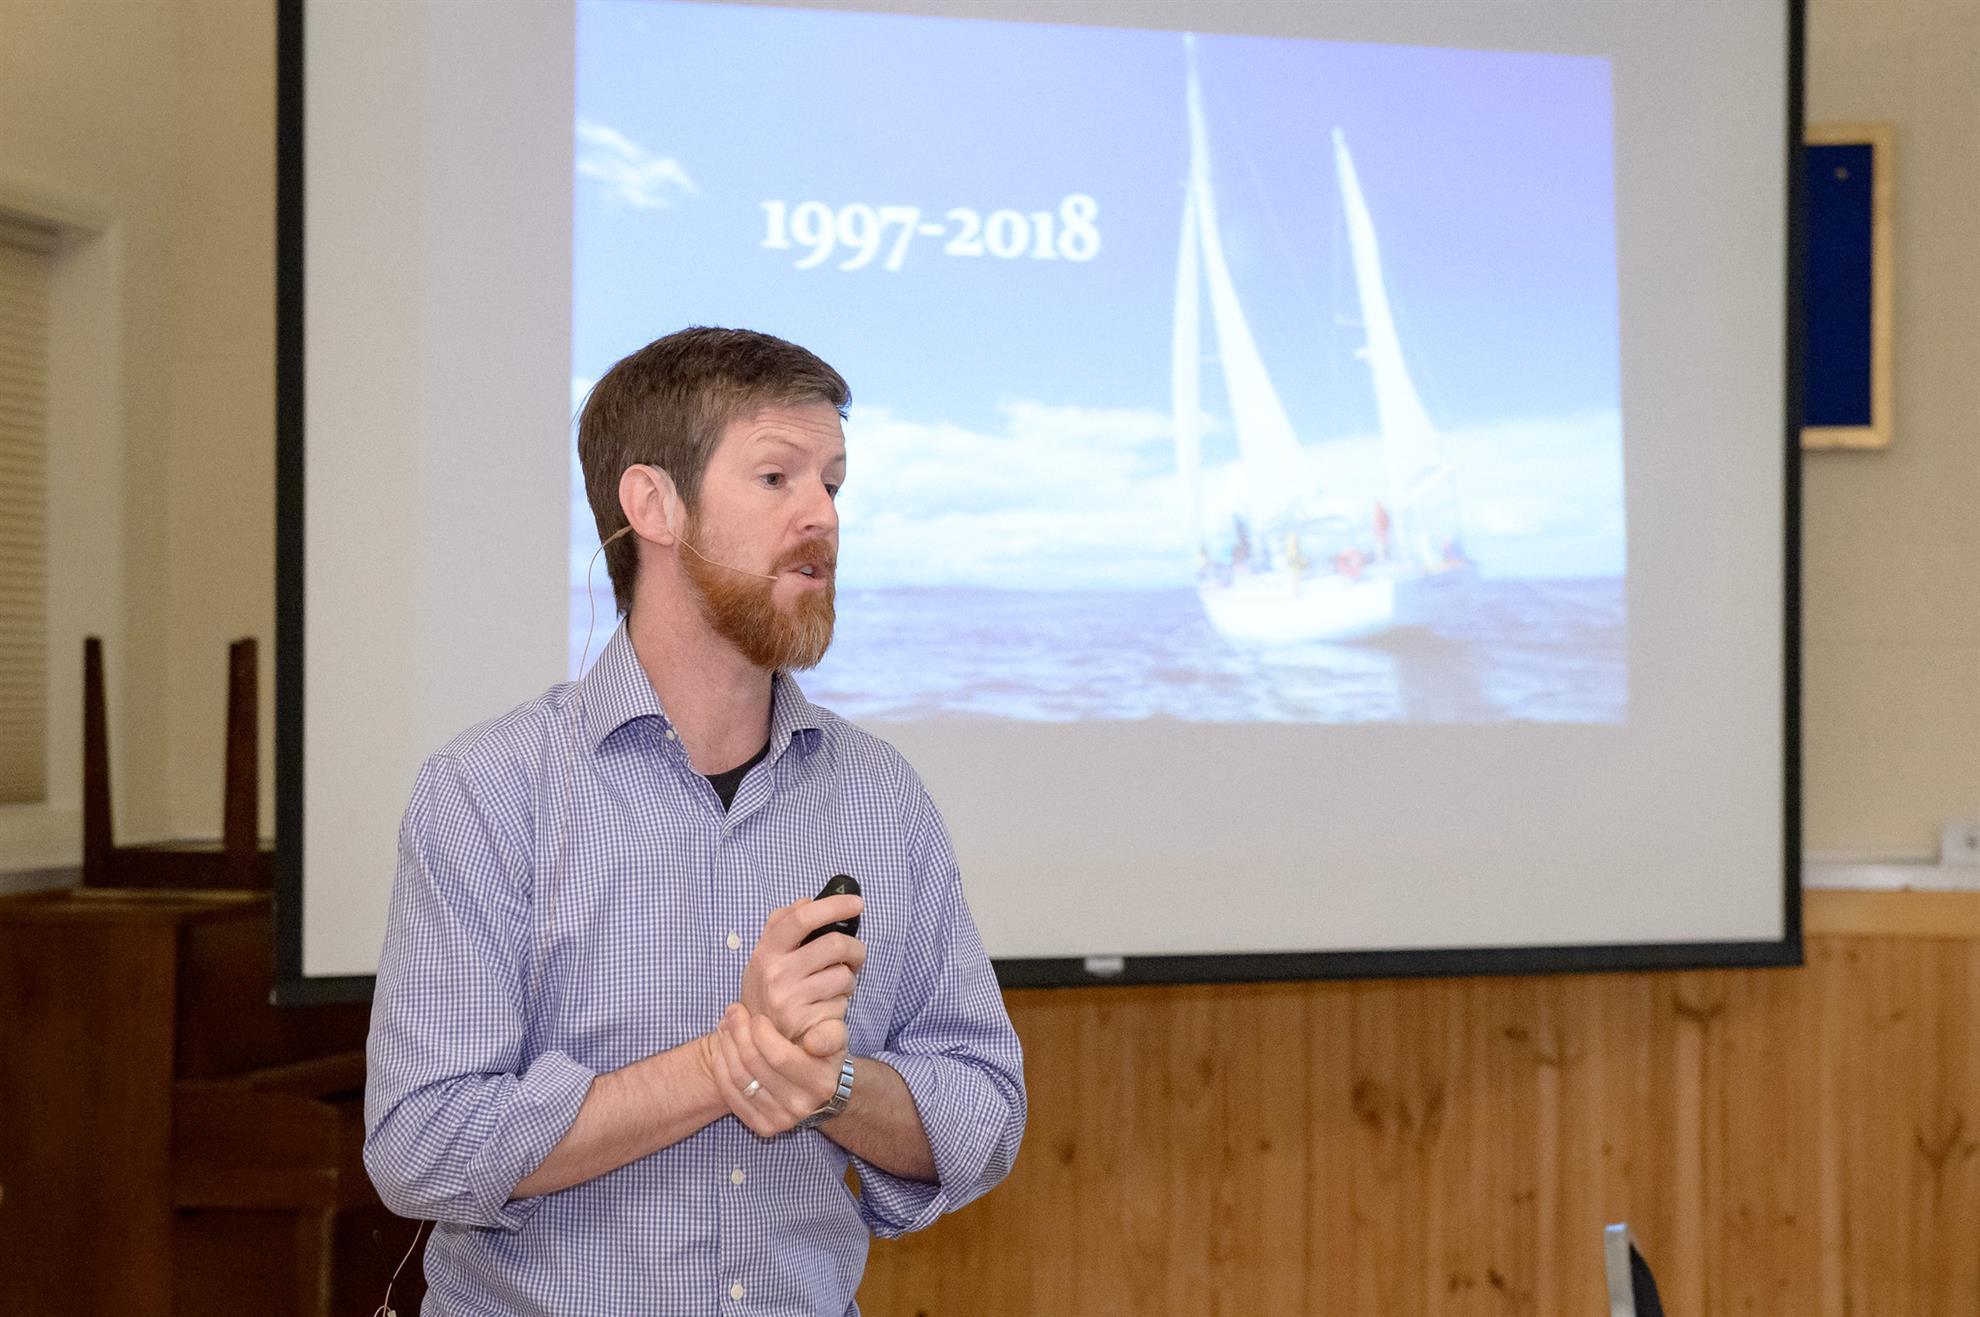 Presentation: Seth Muir, of Salish Sea Expeditions